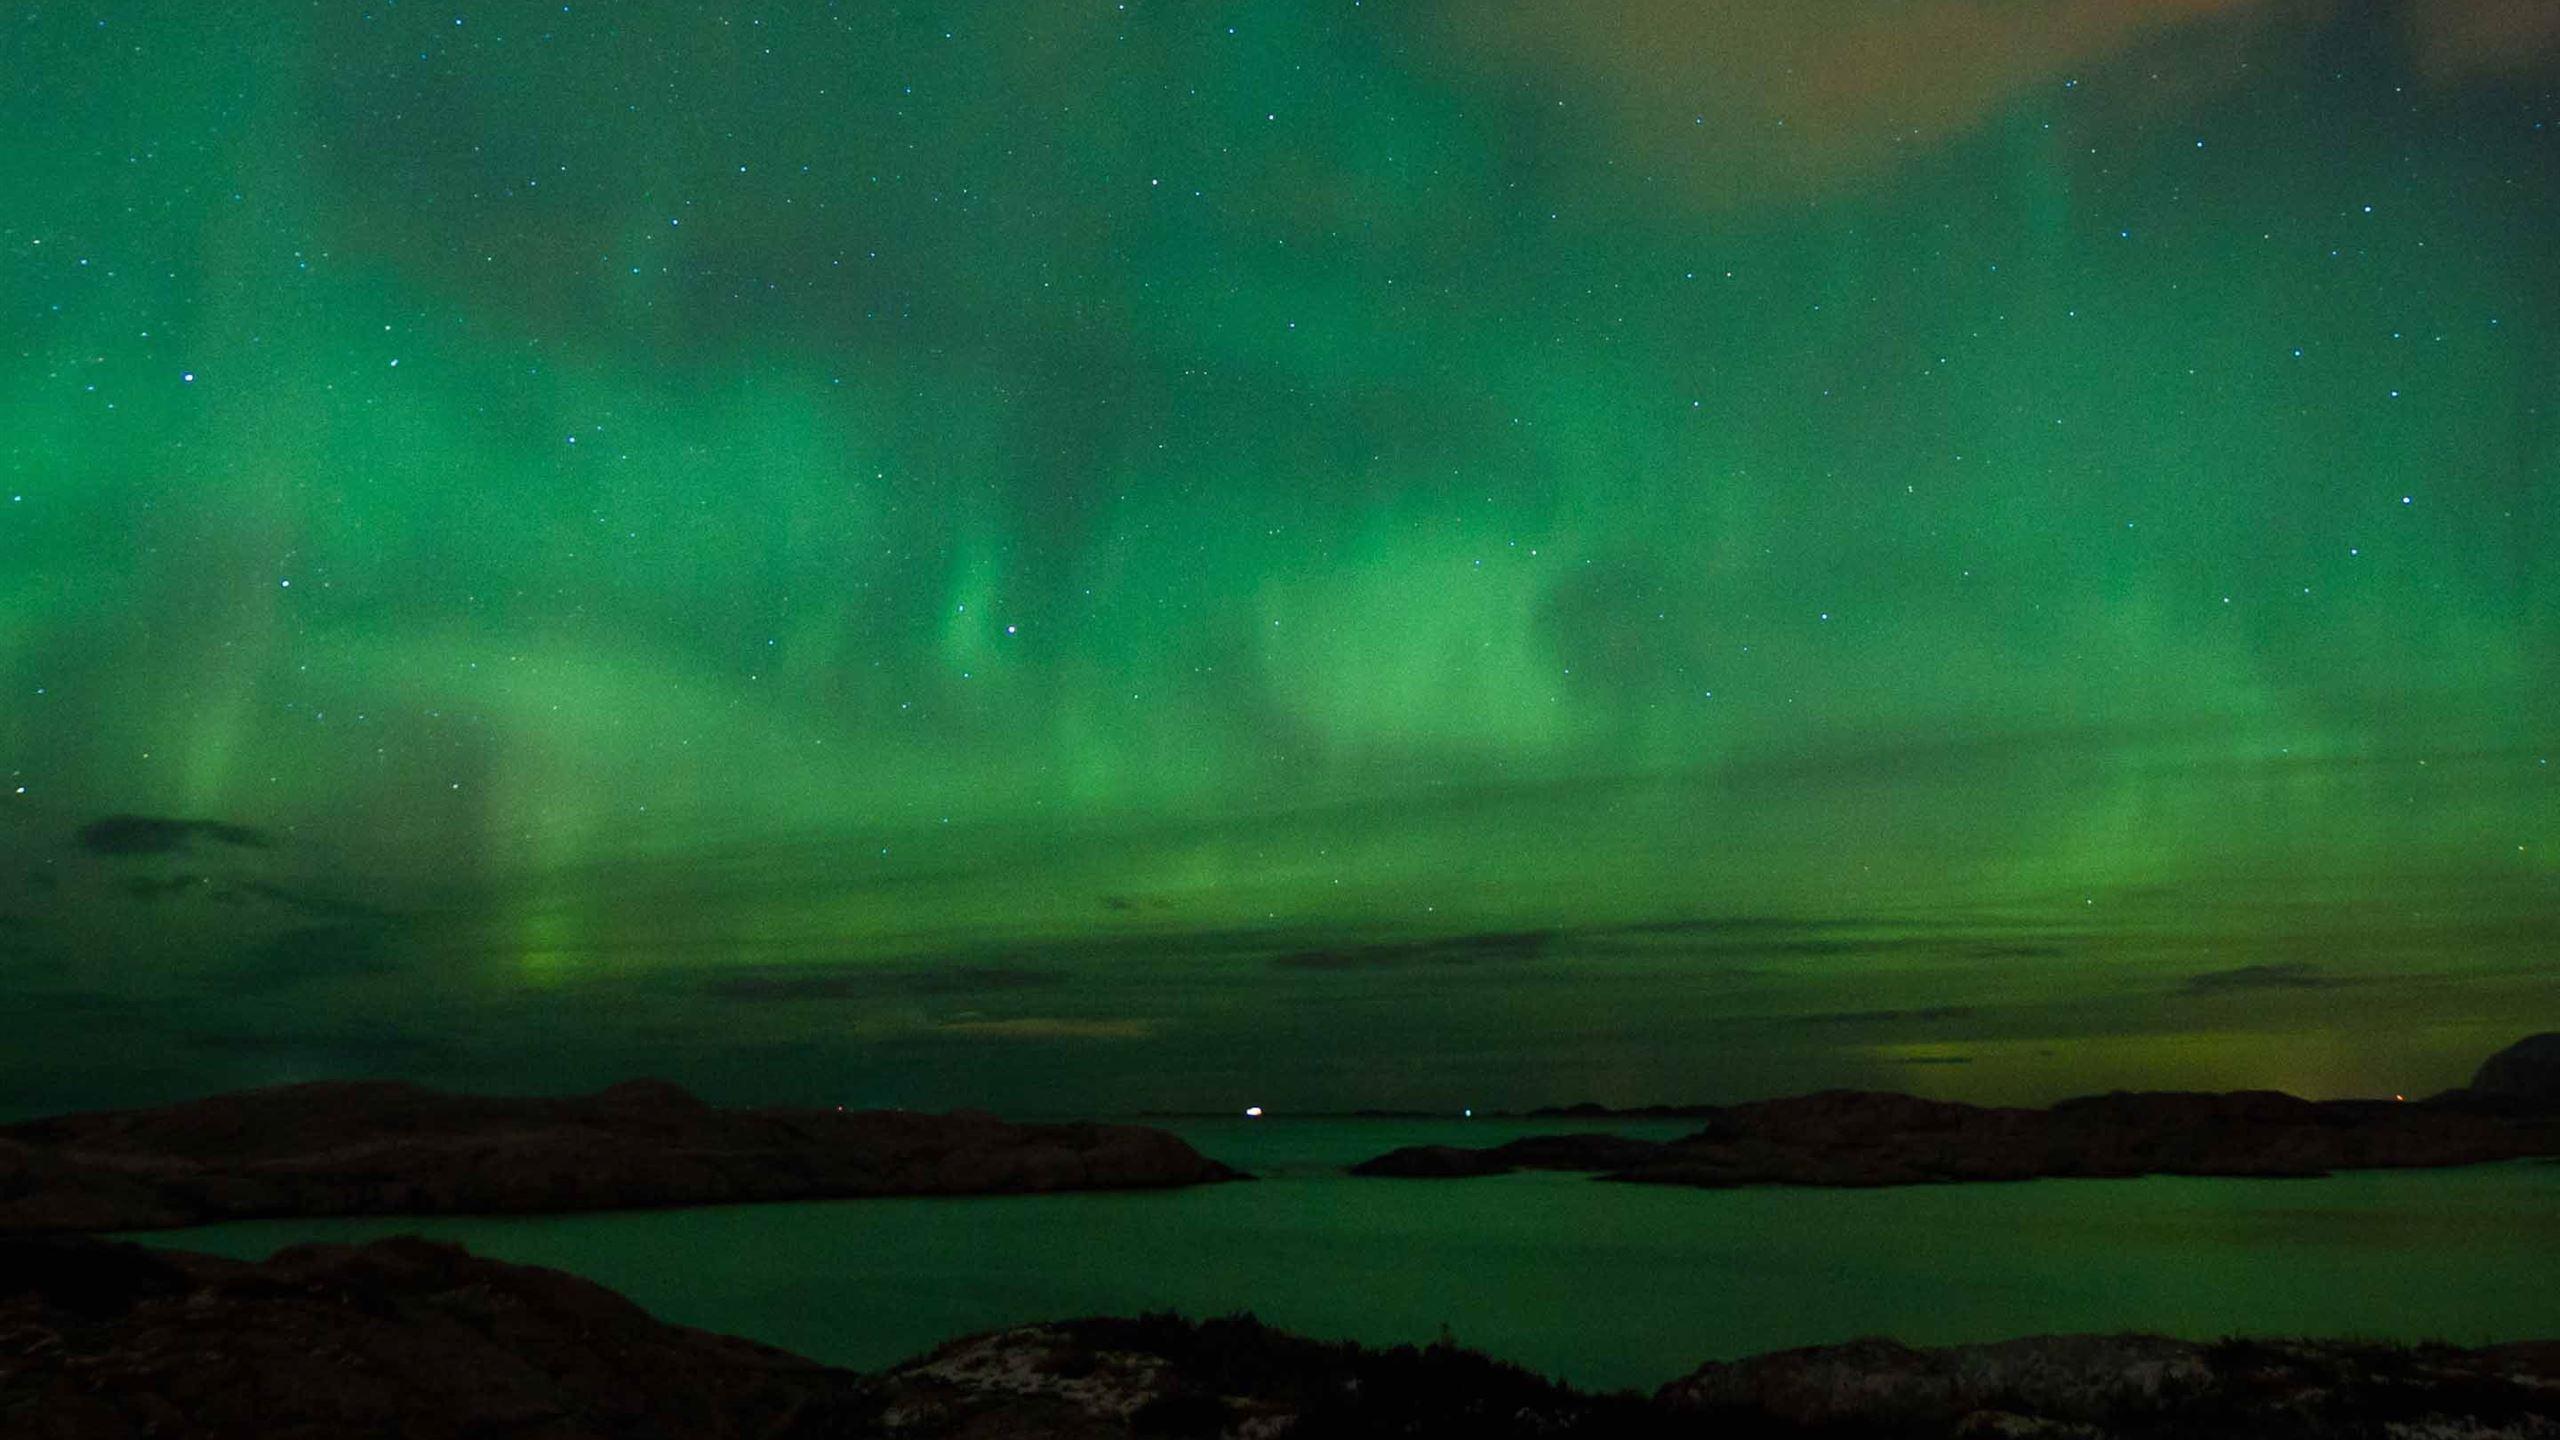 Aurora Borealis Norway Macbook Air Wallpaper Download Allmacwallpaper